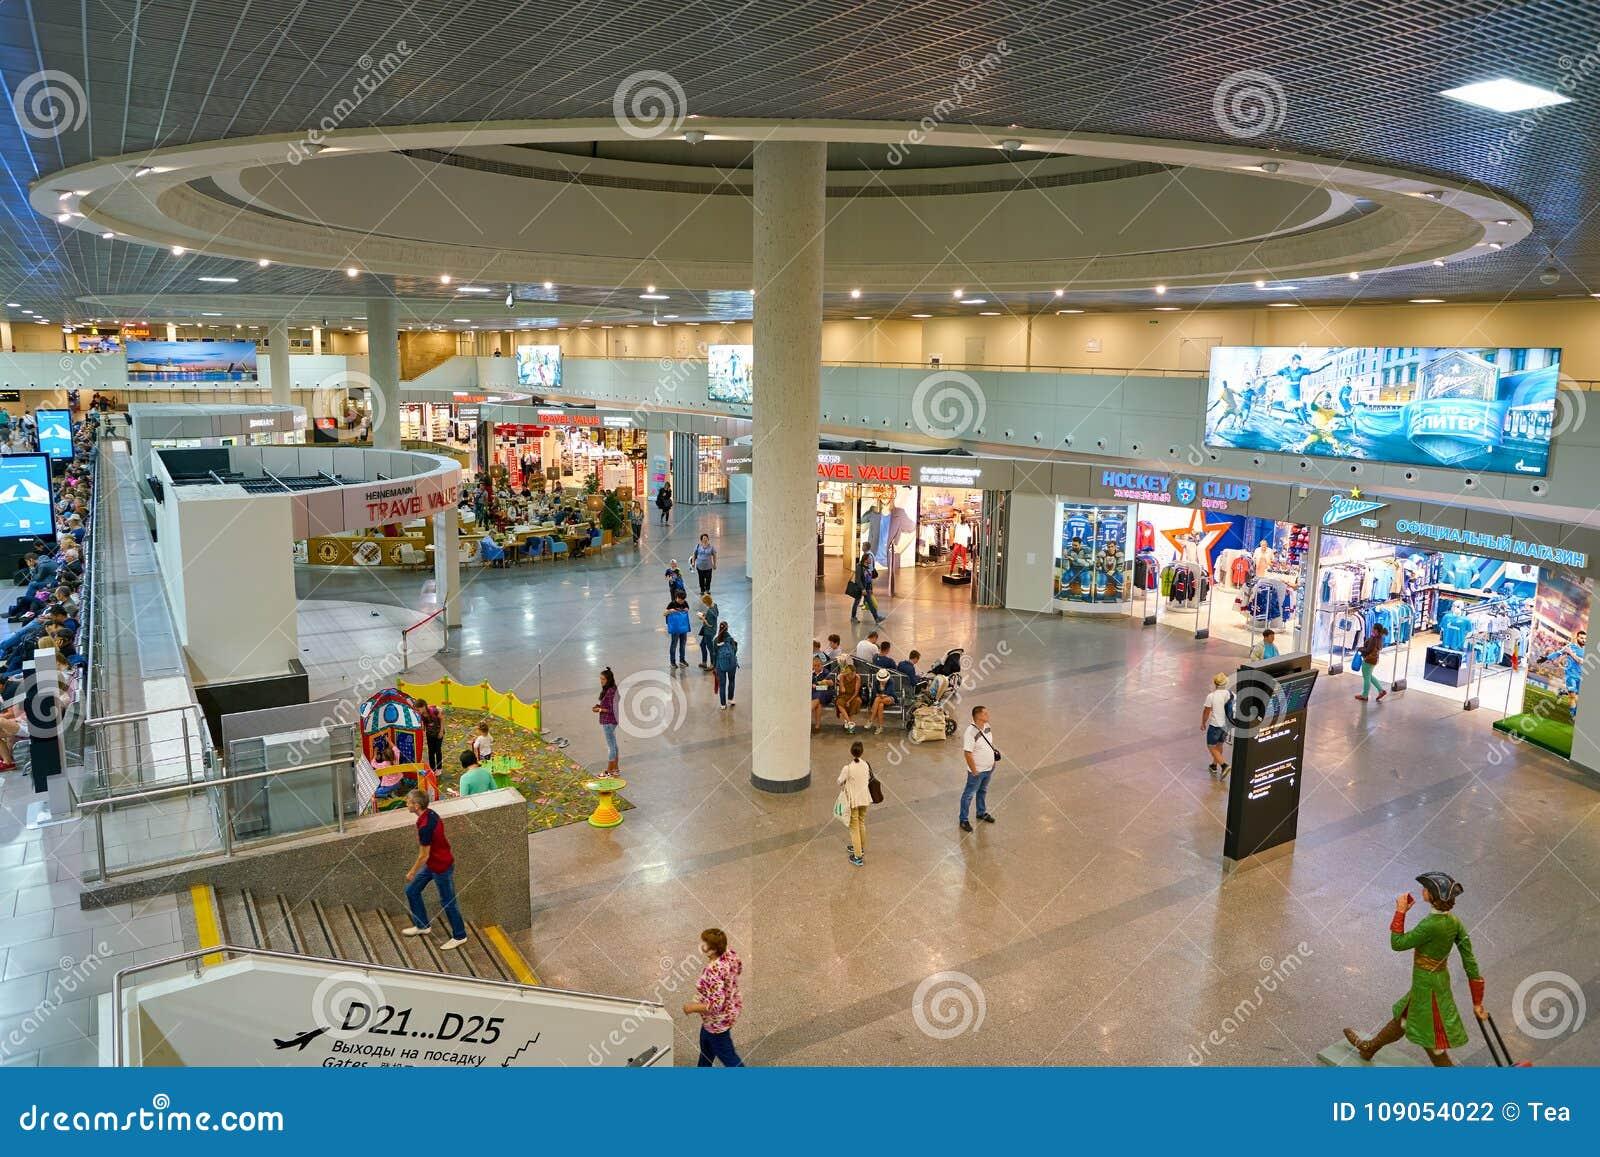 Pulkovo International Airport: description and infrastructure 91